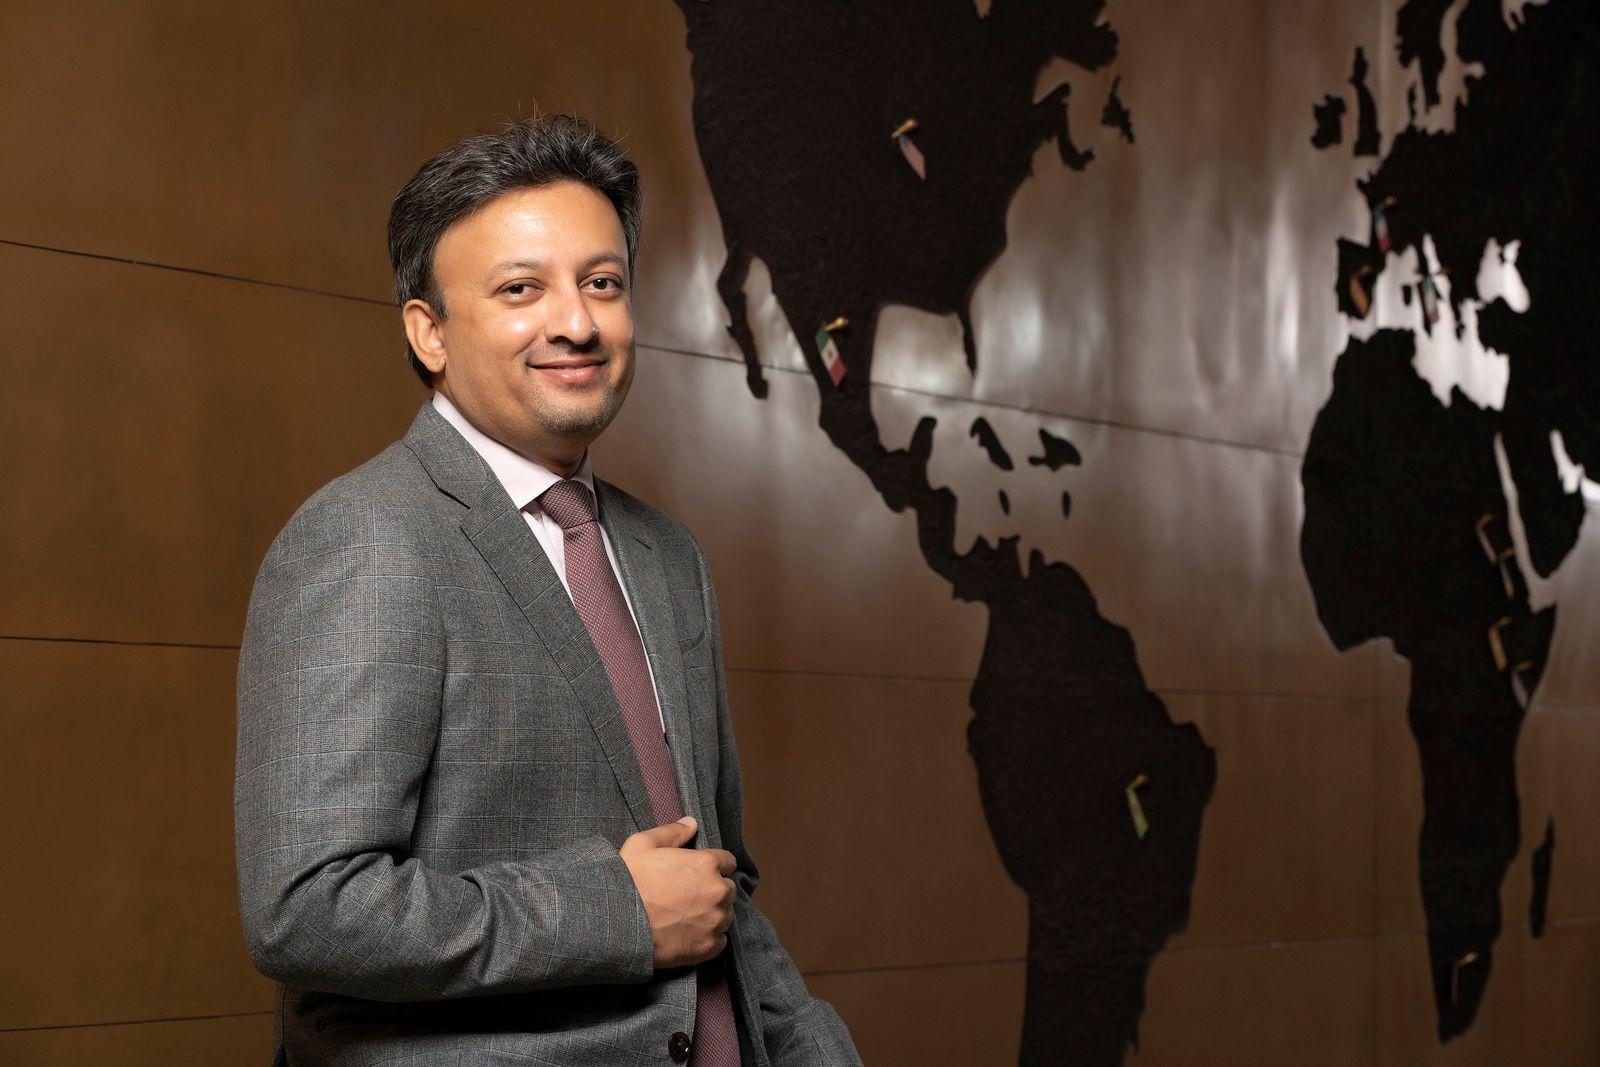 Dr. Sharvil Patel, Managing Director, Zydus Group